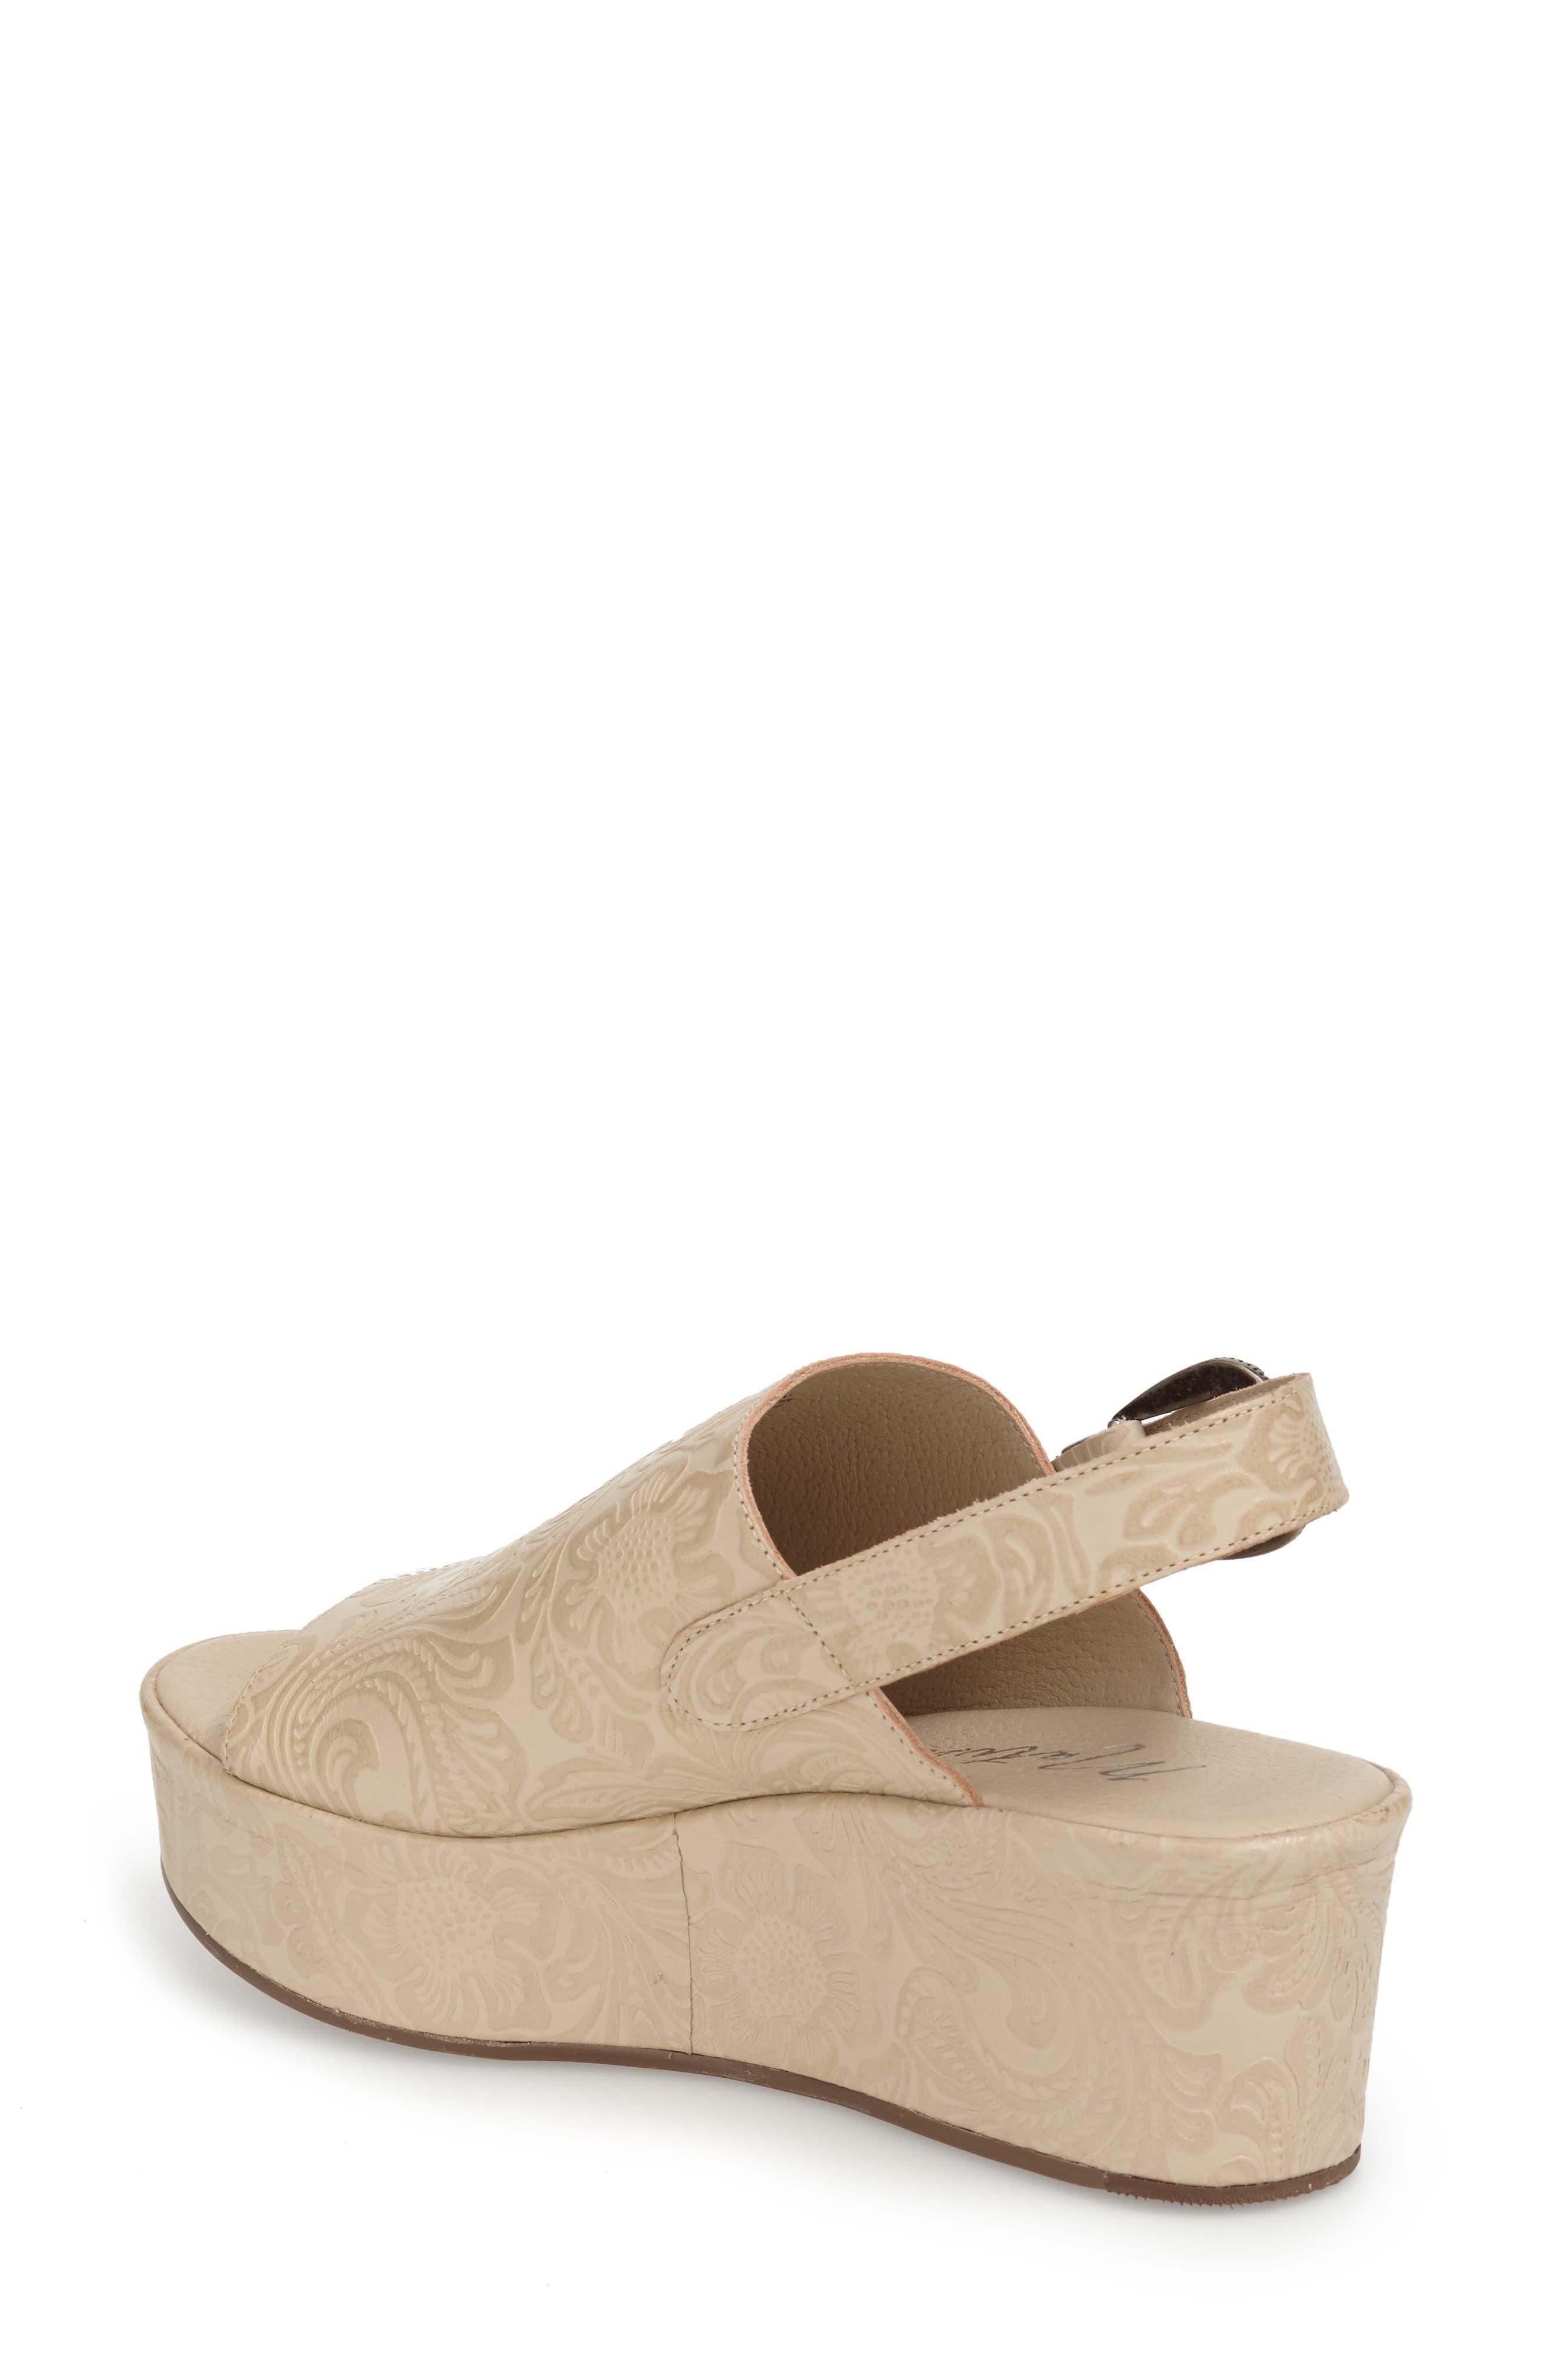 Embossed Slingback Platform Sandal,                             Alternate thumbnail 3, color,                             250